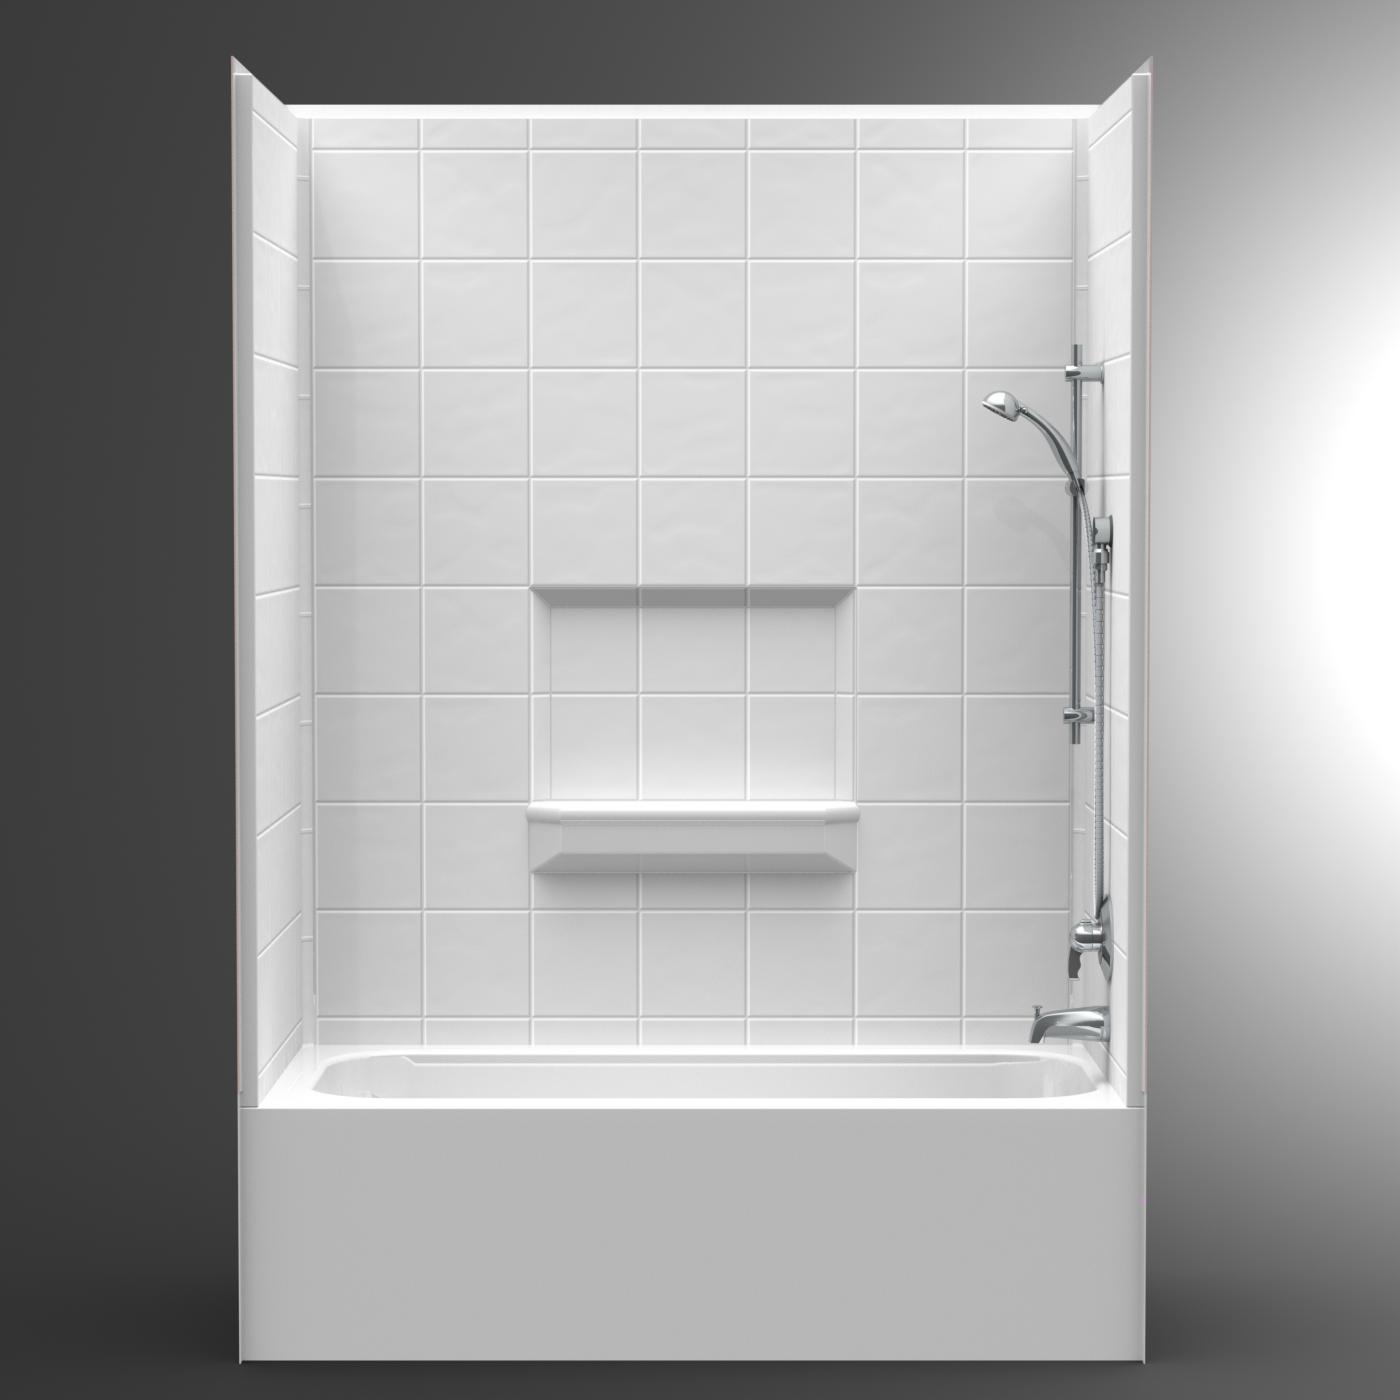 Multi Piece 60 X 30 X 85 Tub Shower Combo 17 Curb Skirt Height 4lets6030 V2 Bestbath Tub Shower Combo Bathroom Tub Shower Combo Tub Shower Combo Remodel